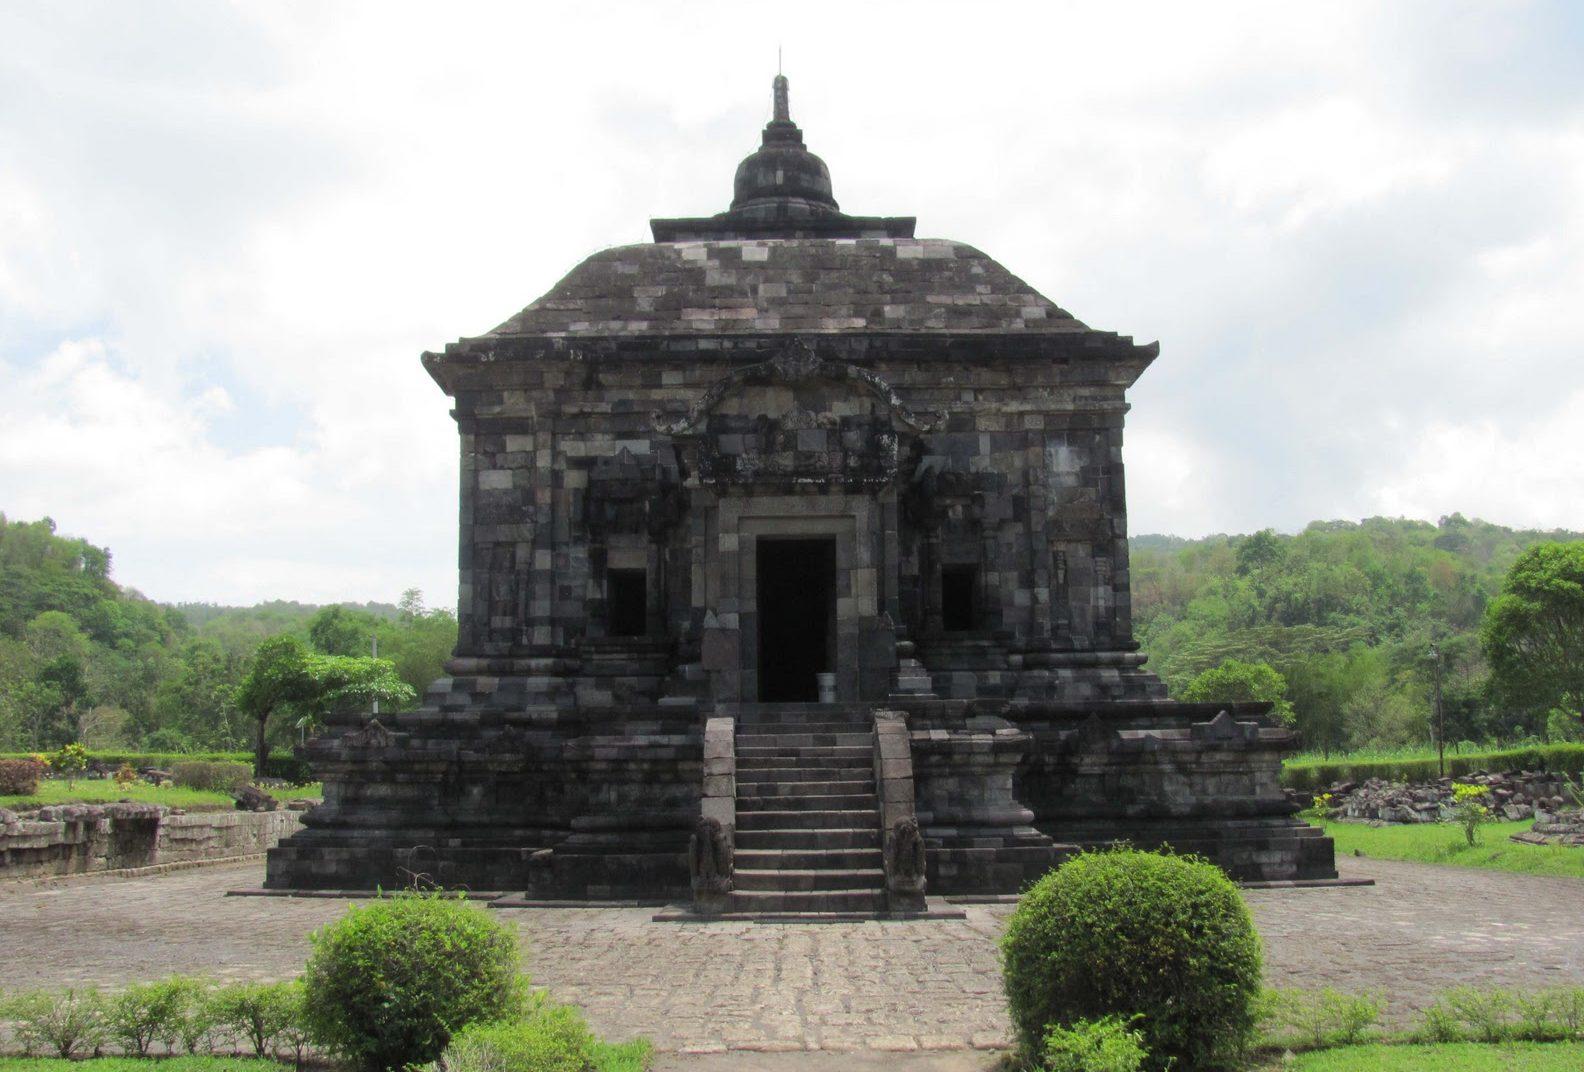 Candi Banyunibo Terletak Kabupaten Sleman Yogyakarta Menyendiri Terpisah Lainnya Awal